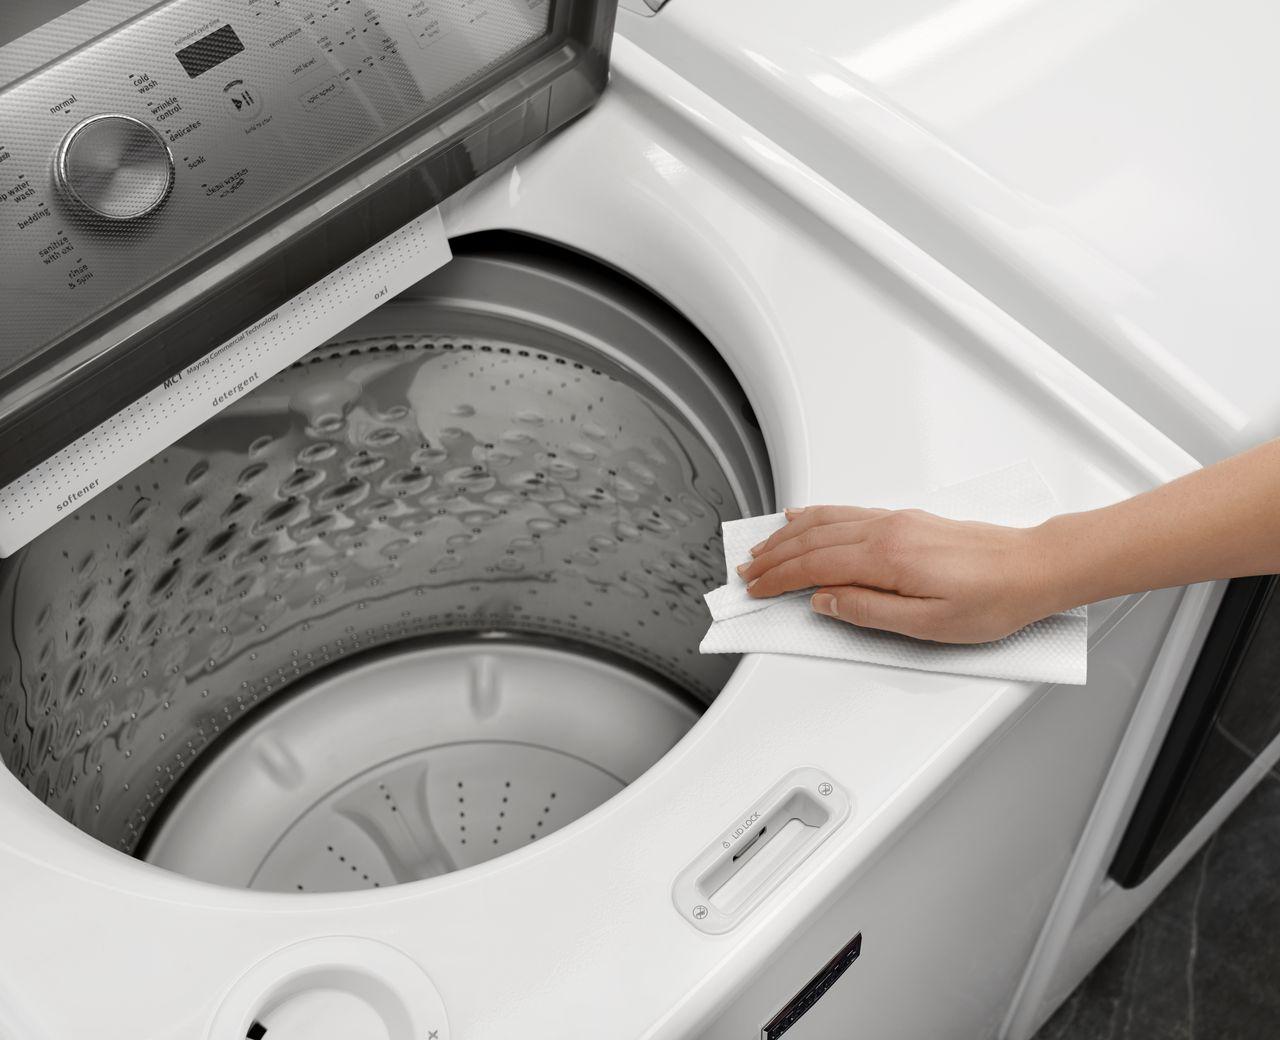 تمیز کردنه ماشین لباس شویی دو قلو